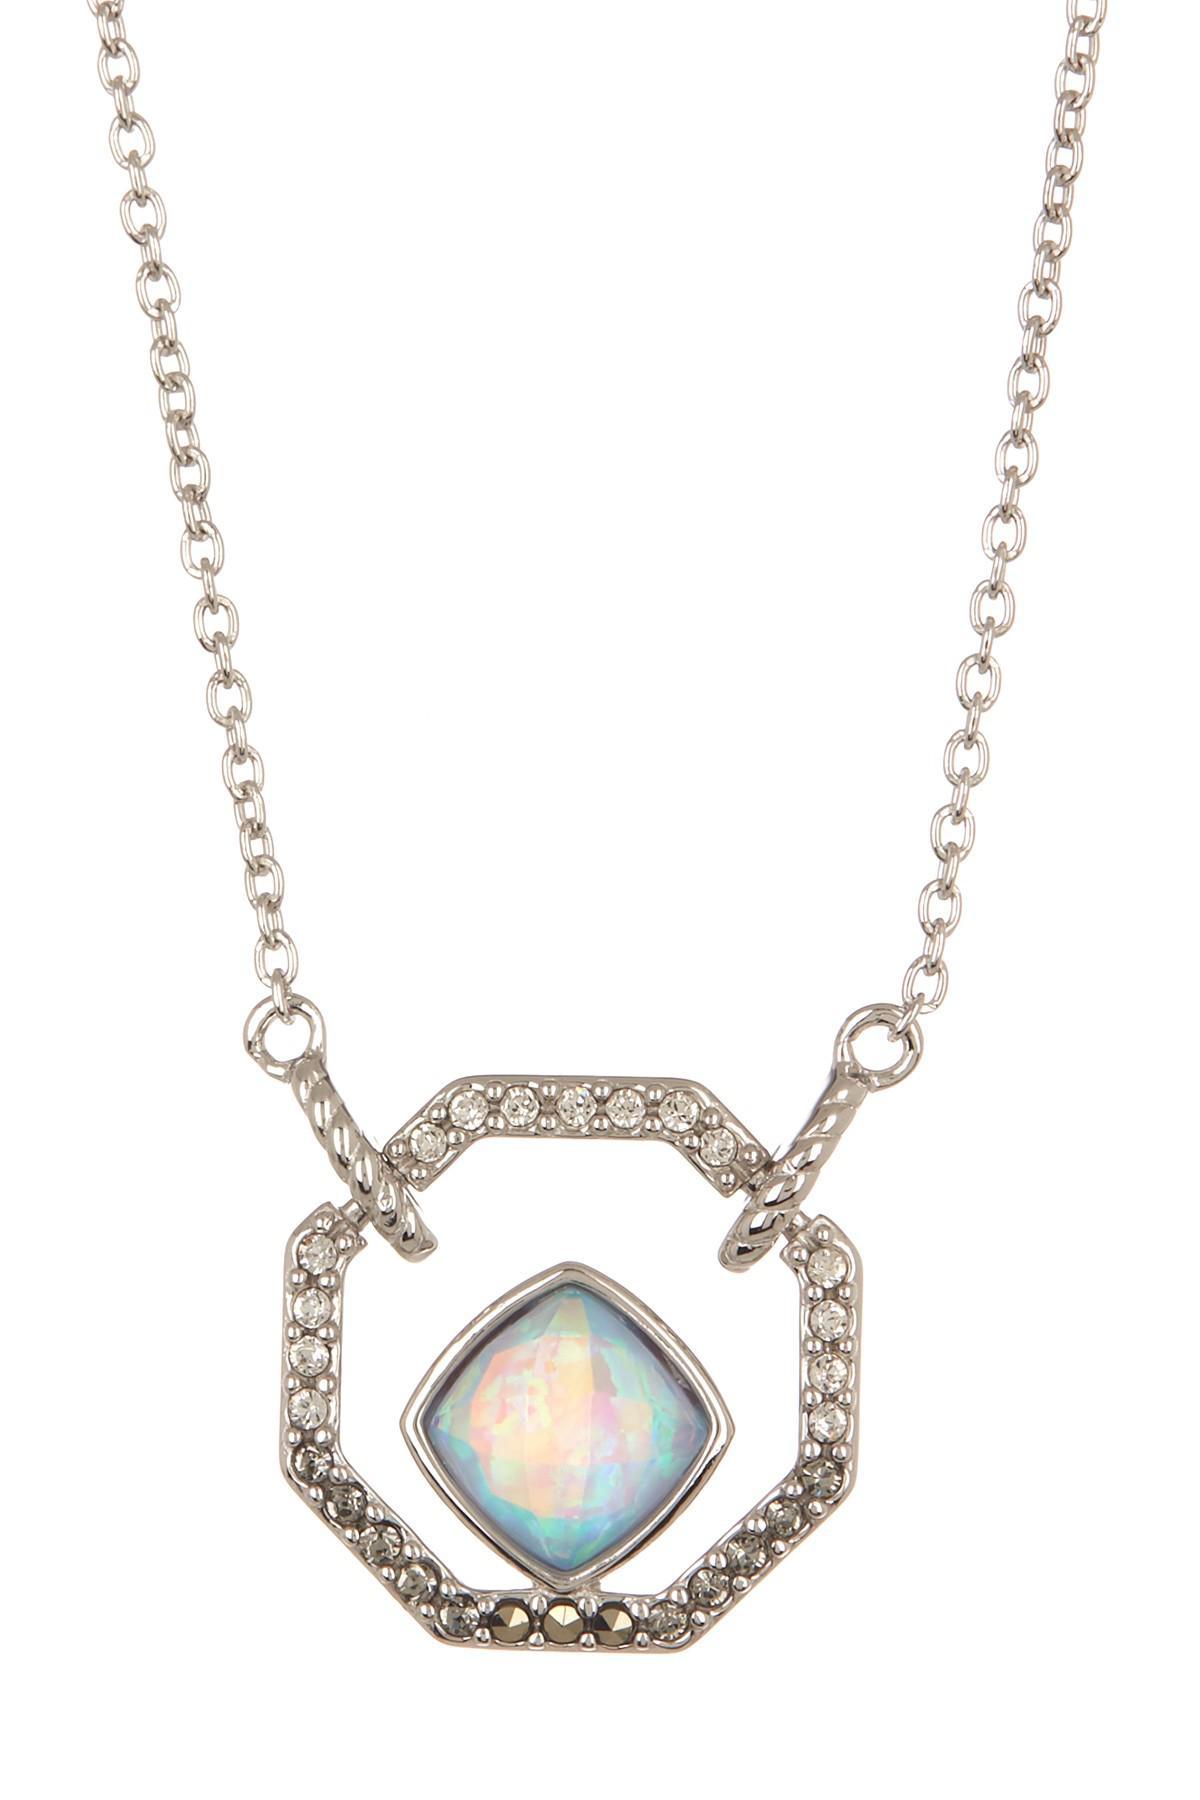 210e29391 Lyst - Judith Jack Sterling Silver Swarovski Crystal & Opal Pendant ...